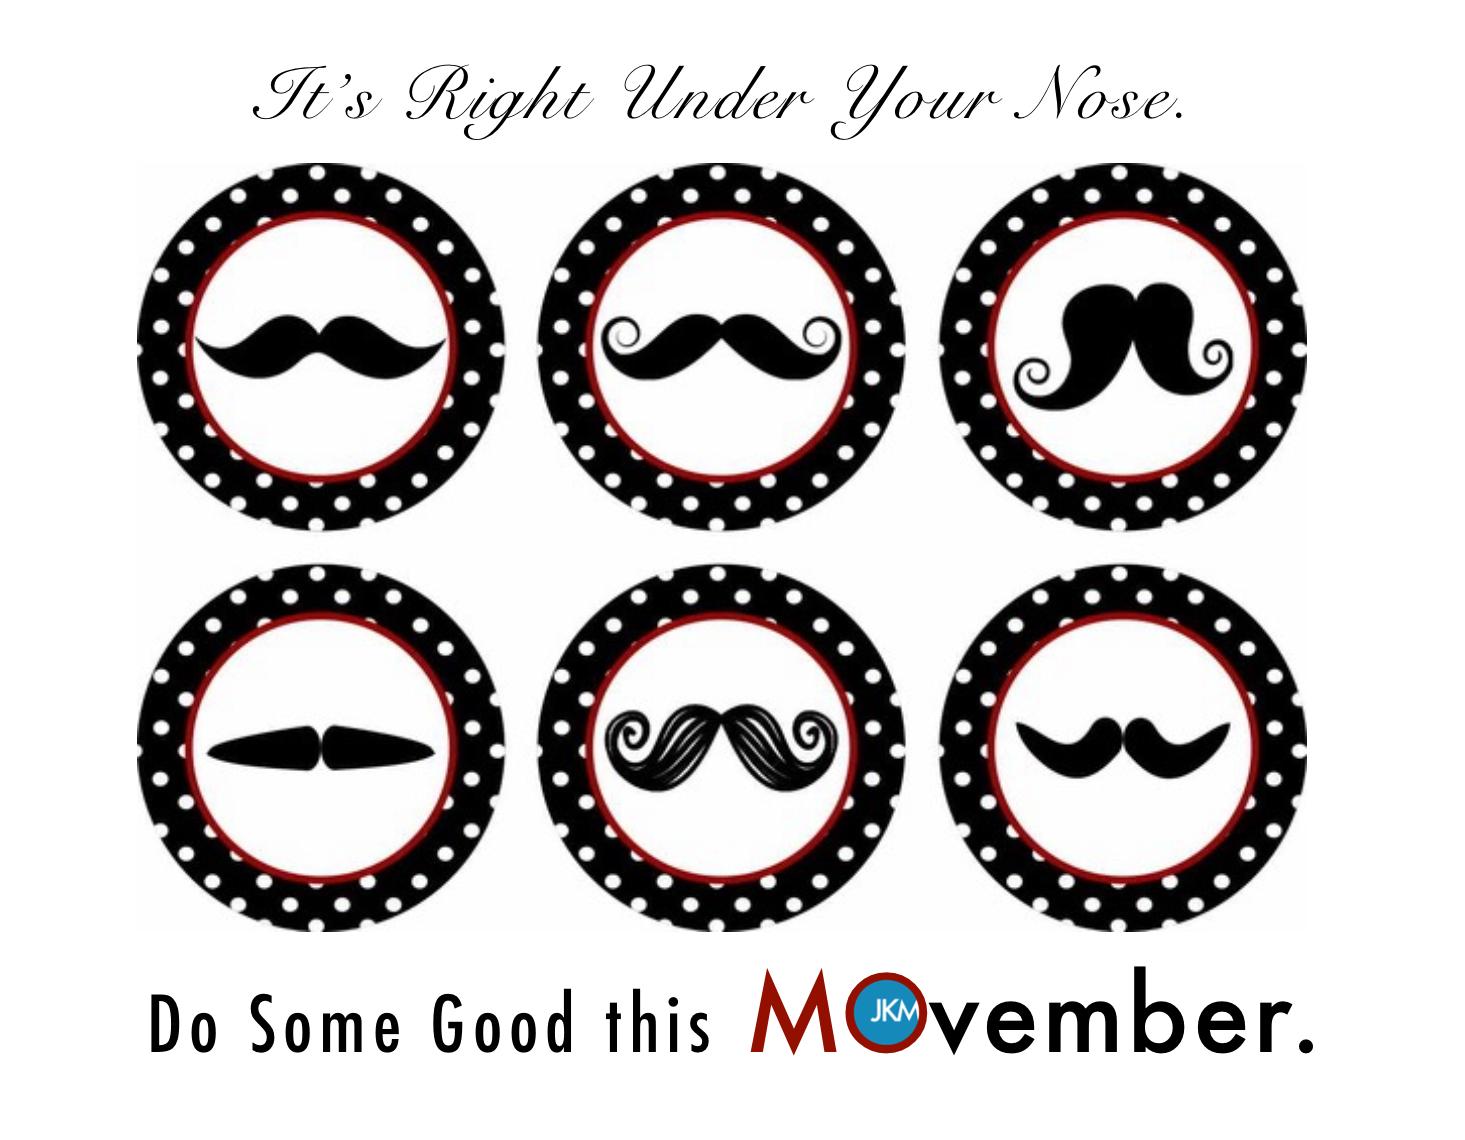 joanne-klee-marketing-movember-mens-health-awareness-2018.png